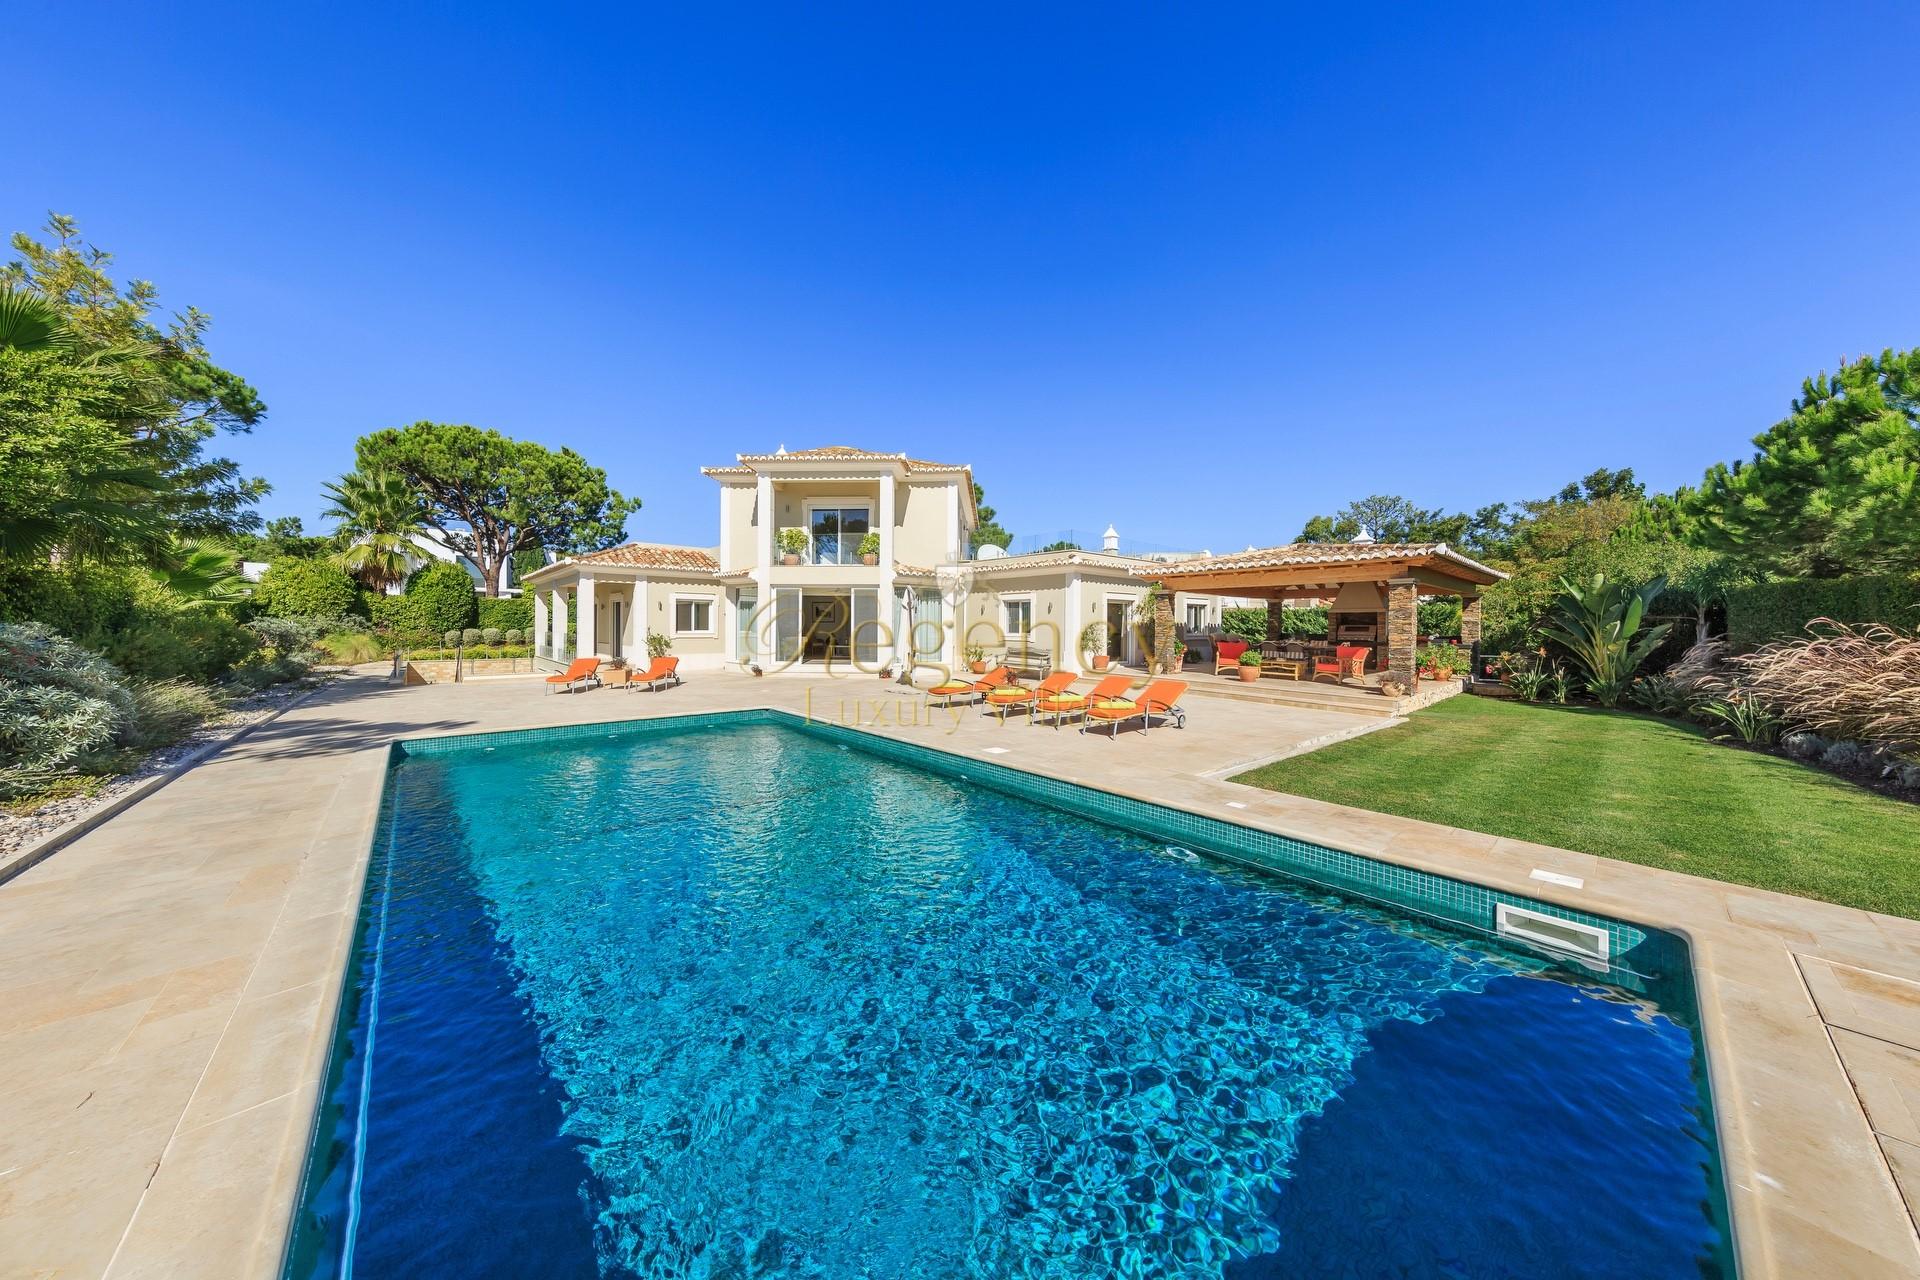 4 Bedroom Luxury Villa To Rent In The Quinta Do Lago Resort Near The Golf Course Games Room Algarve Portugal Villa Eureka Regency Luxury Villas30